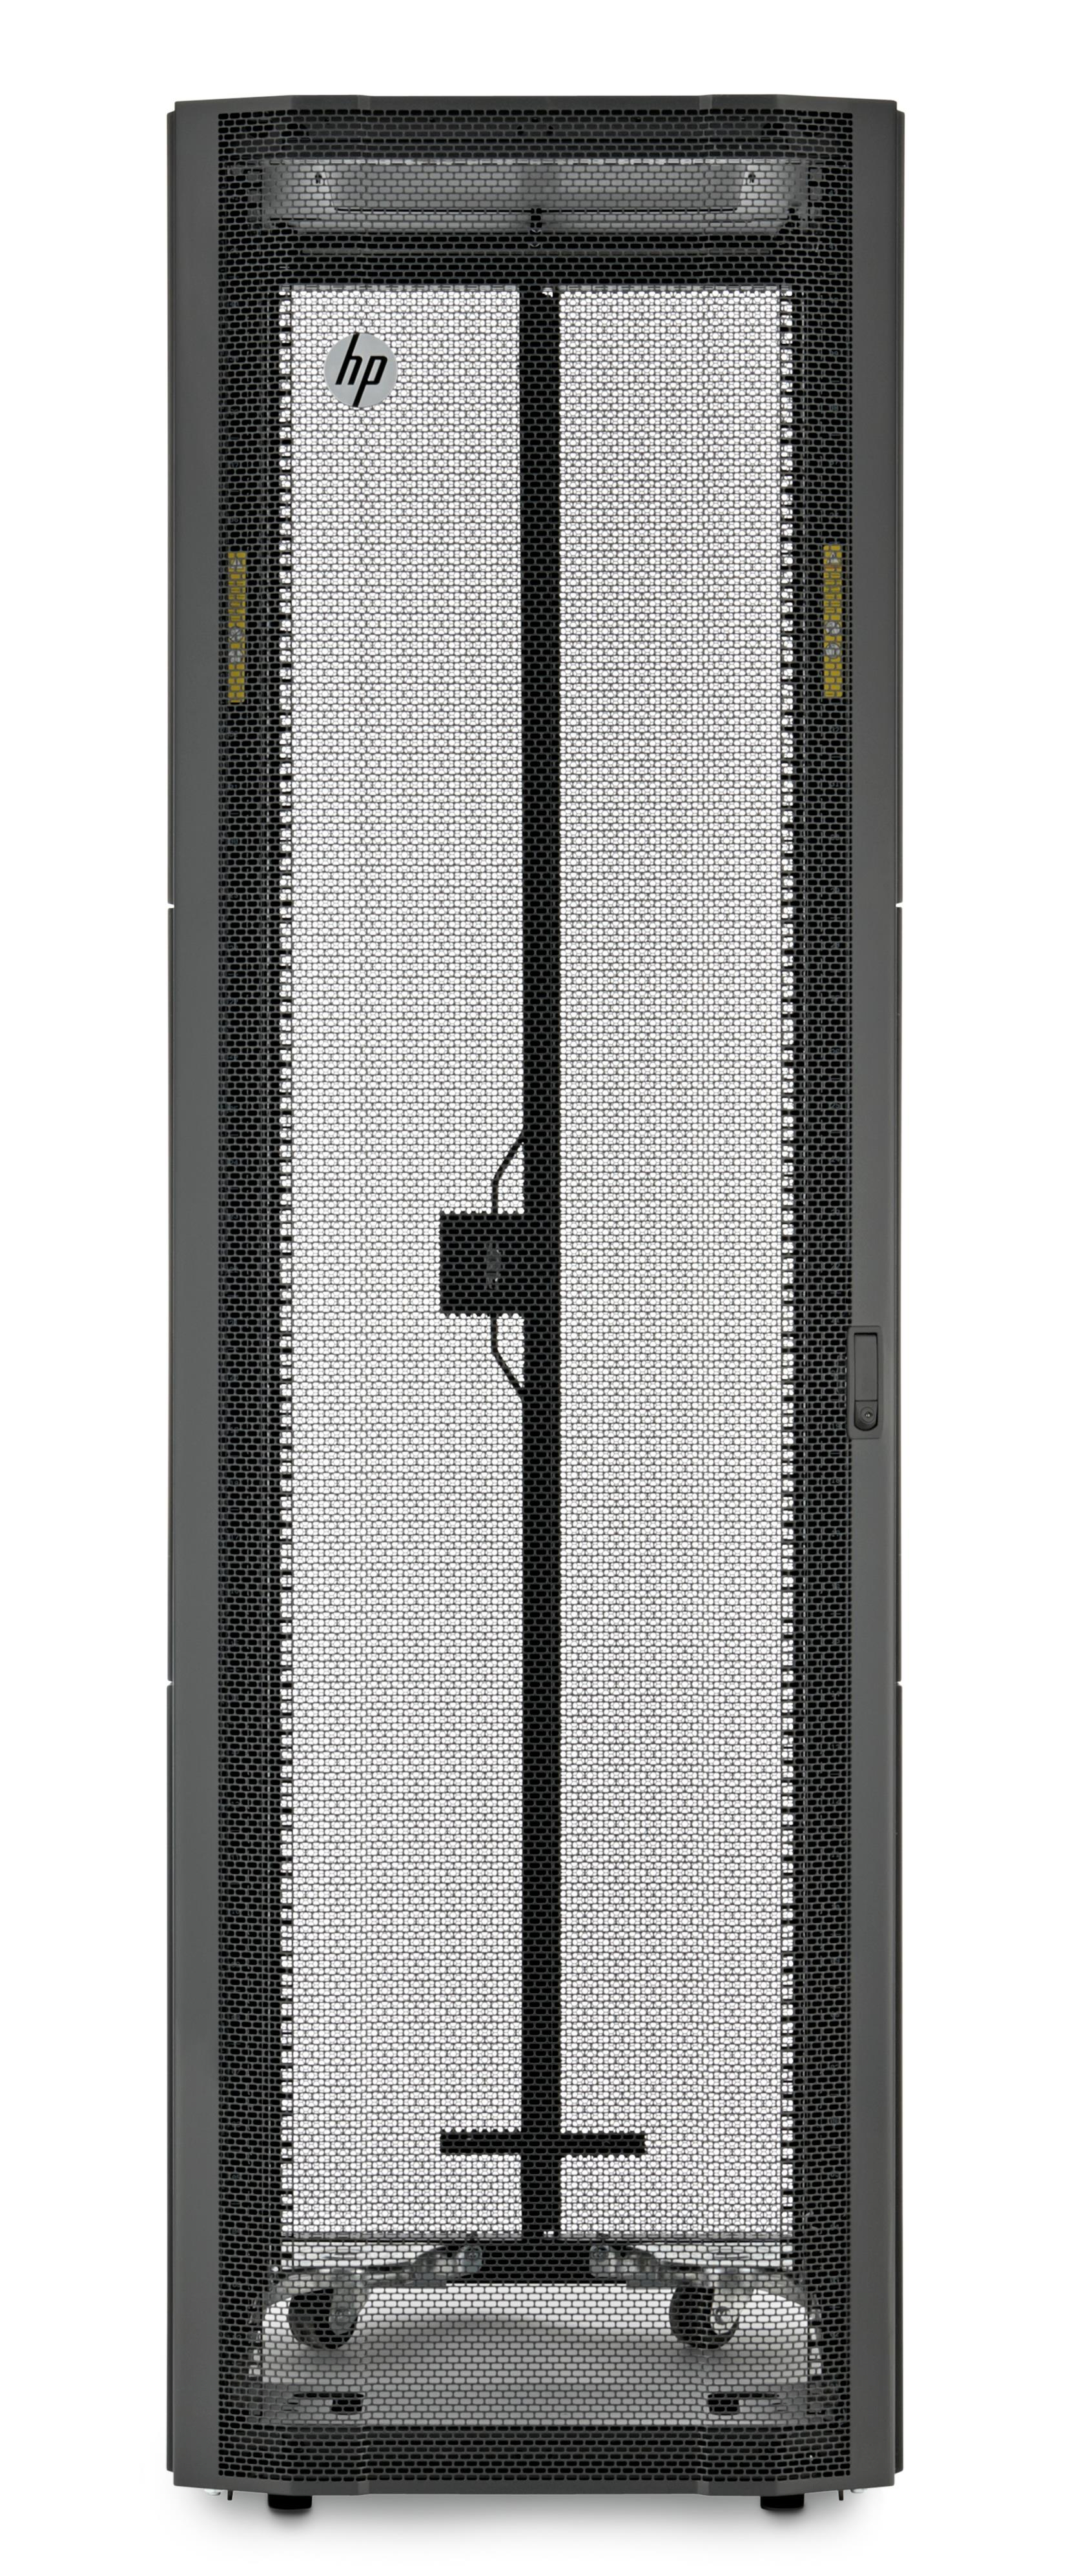 HP 11642 1075mm Shock Universal Rack